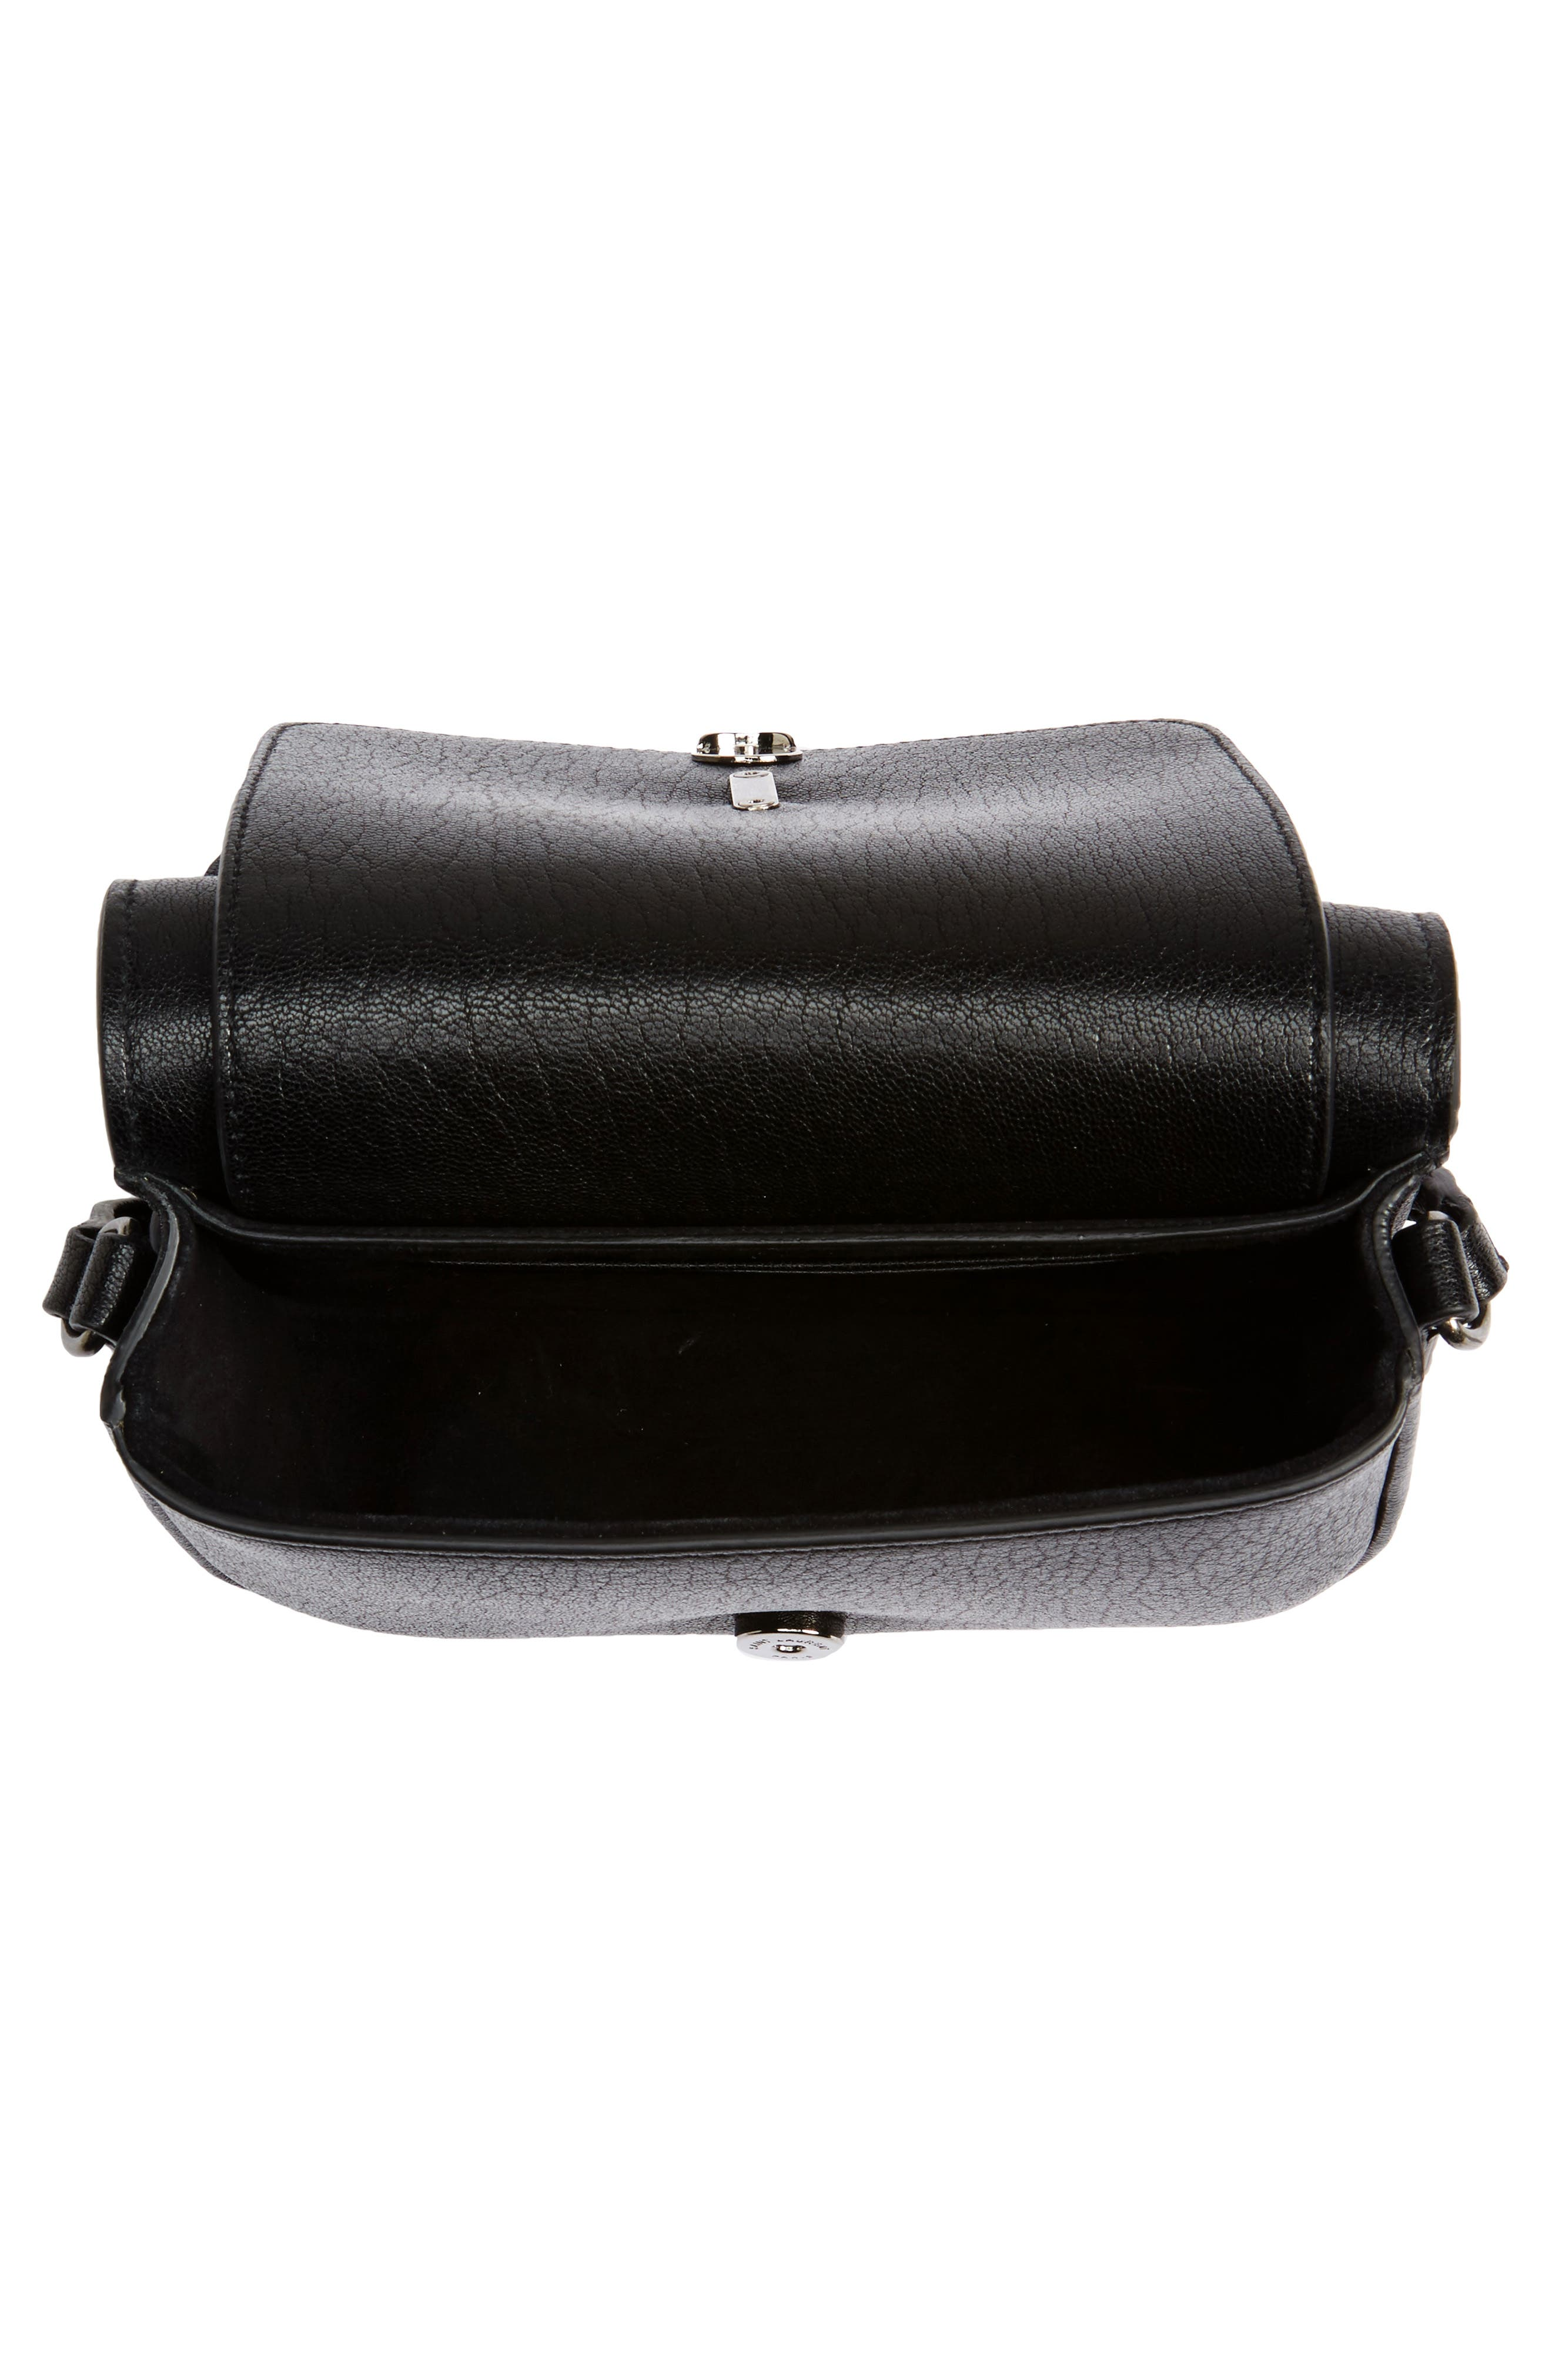 Calfskin Leather Crossbody Bag,                             Alternate thumbnail 4, color,                             001